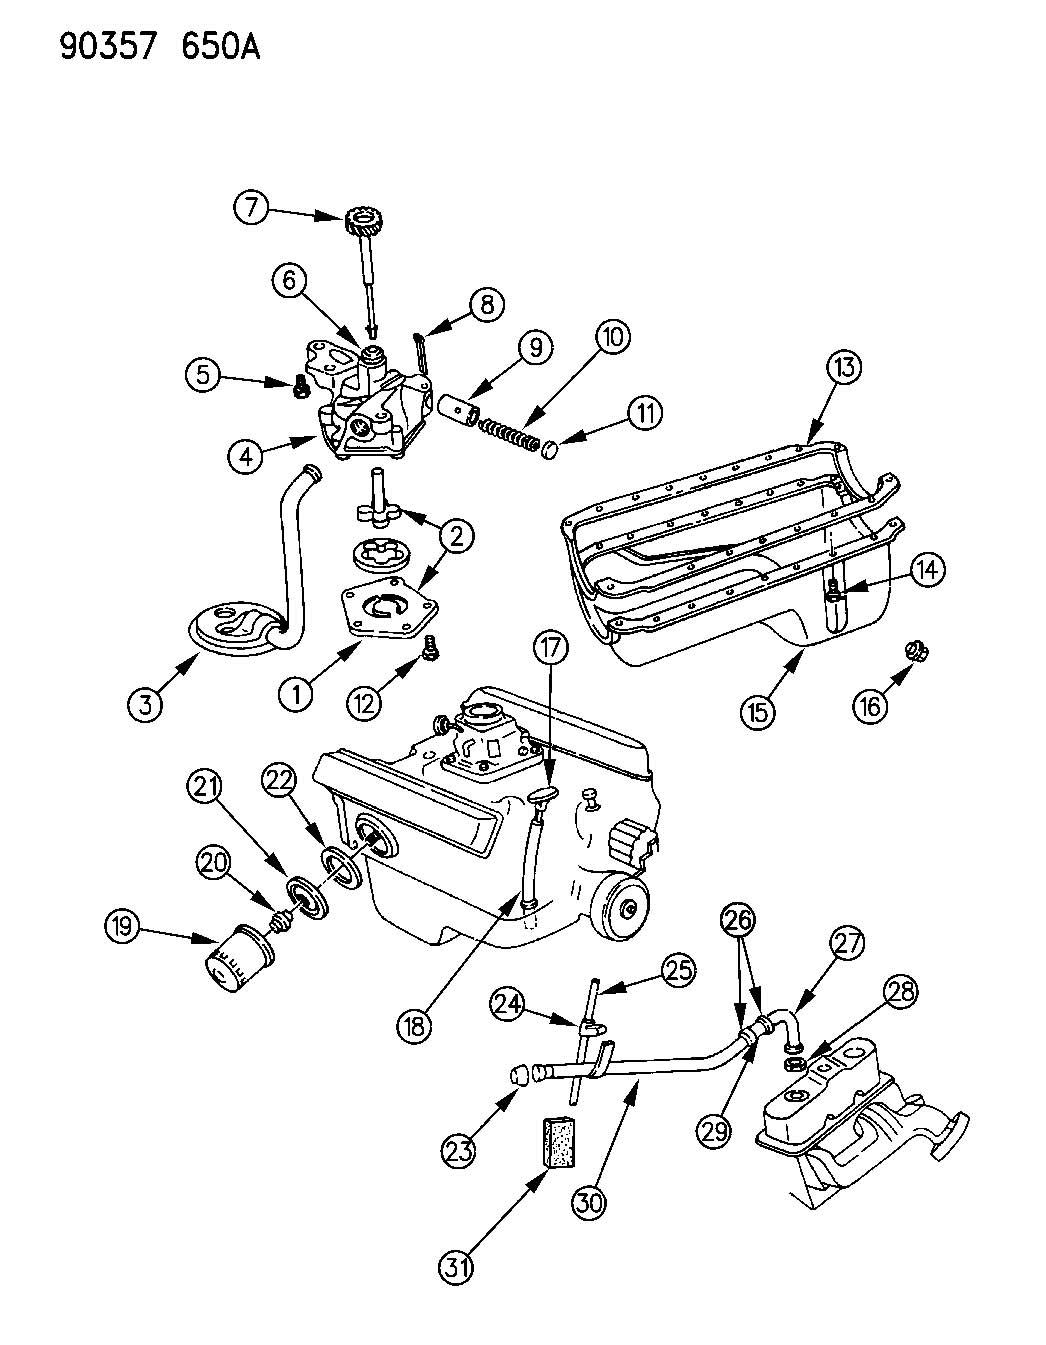 1996 Dodge Dakota Pan. Engine oil. Wheeling, eln